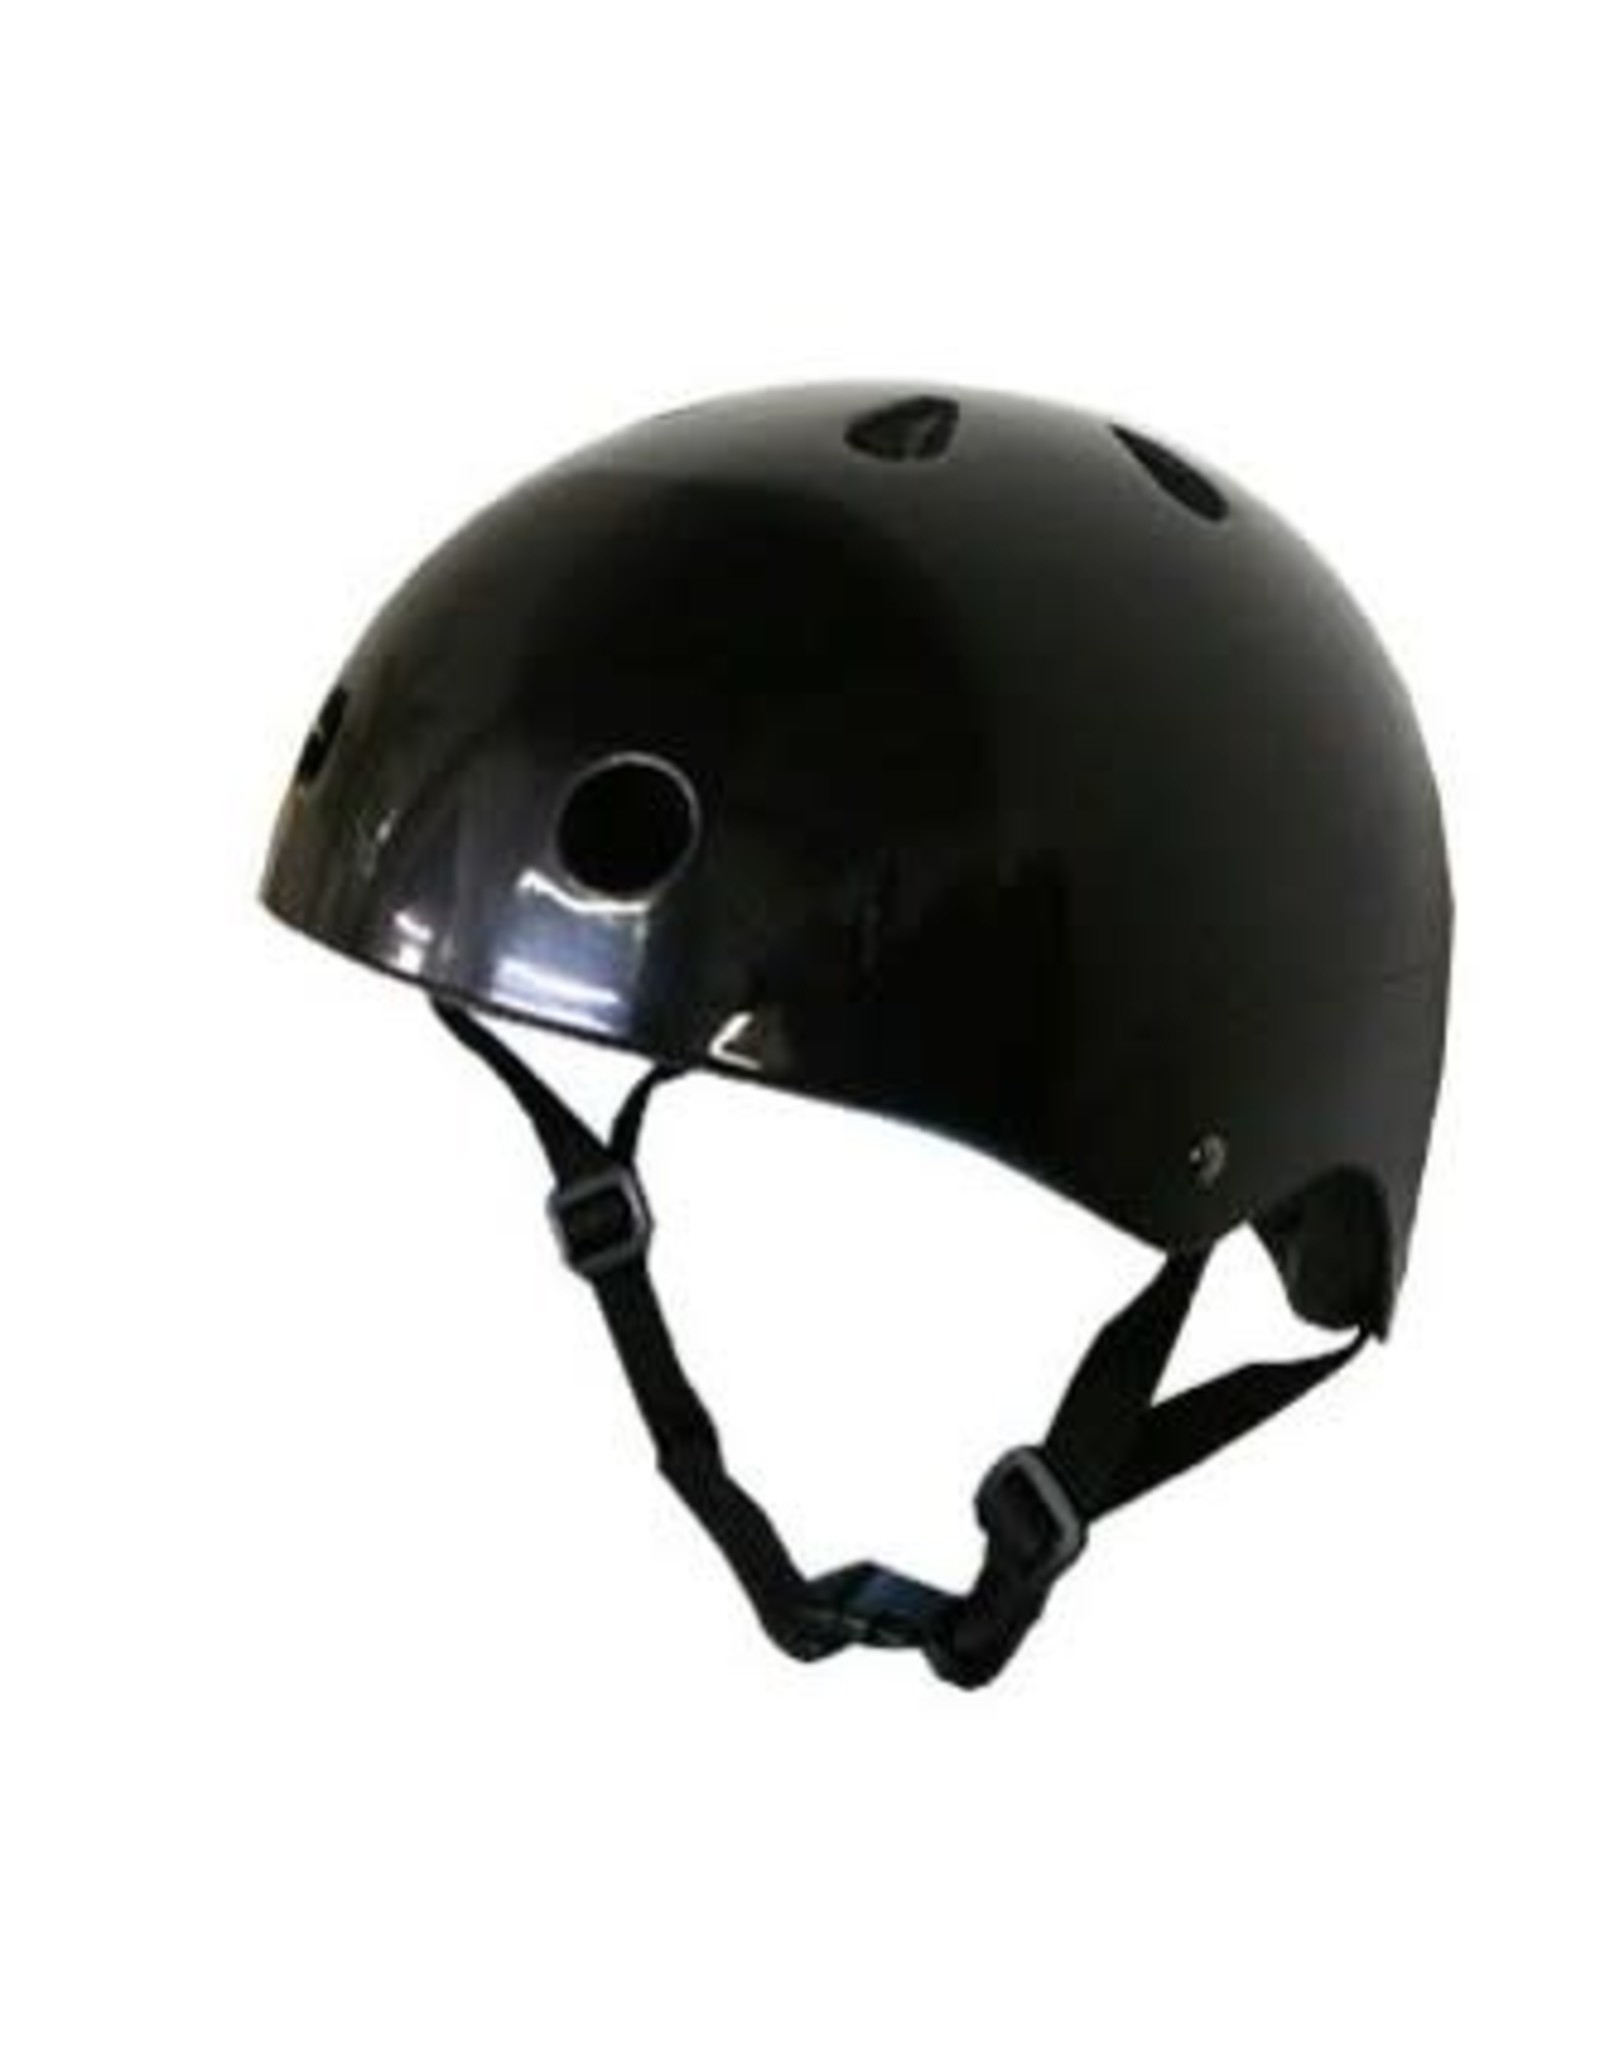 Helmets R Us Helmet - Small SM